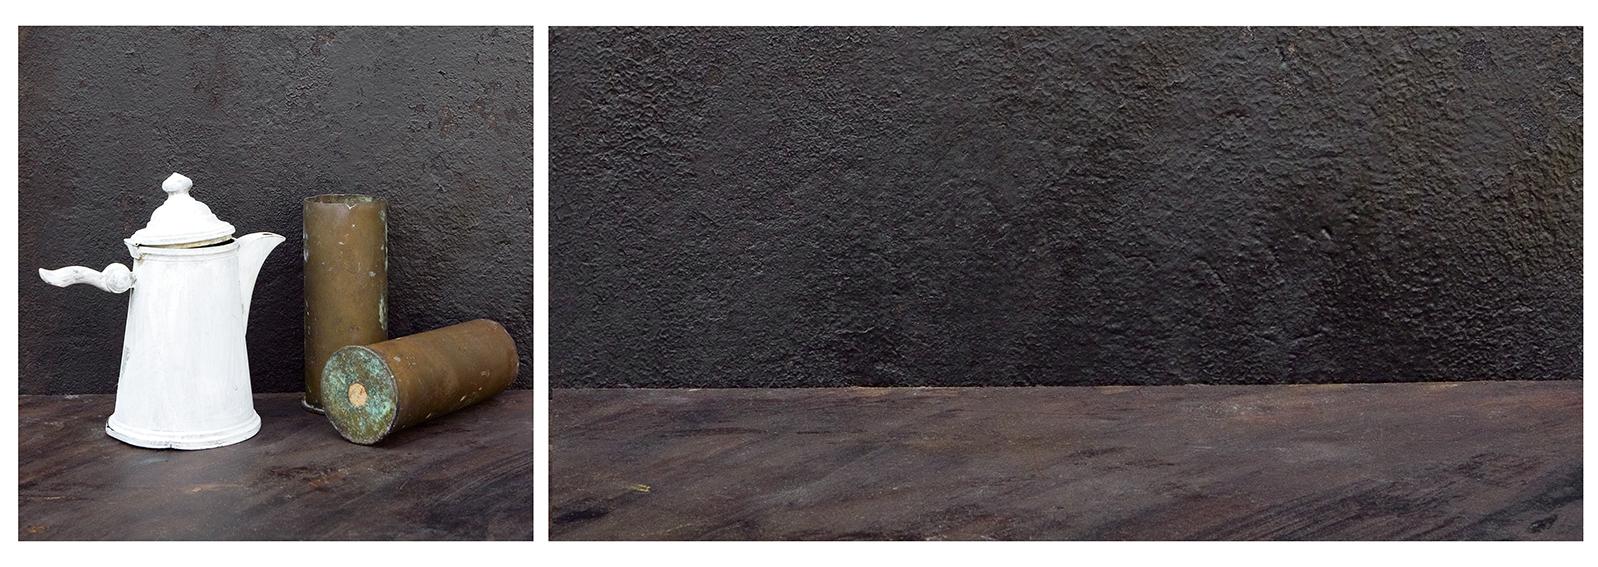 White Kulla 2008, dyptic, Lambda Print | © Maïmouna Guerresi